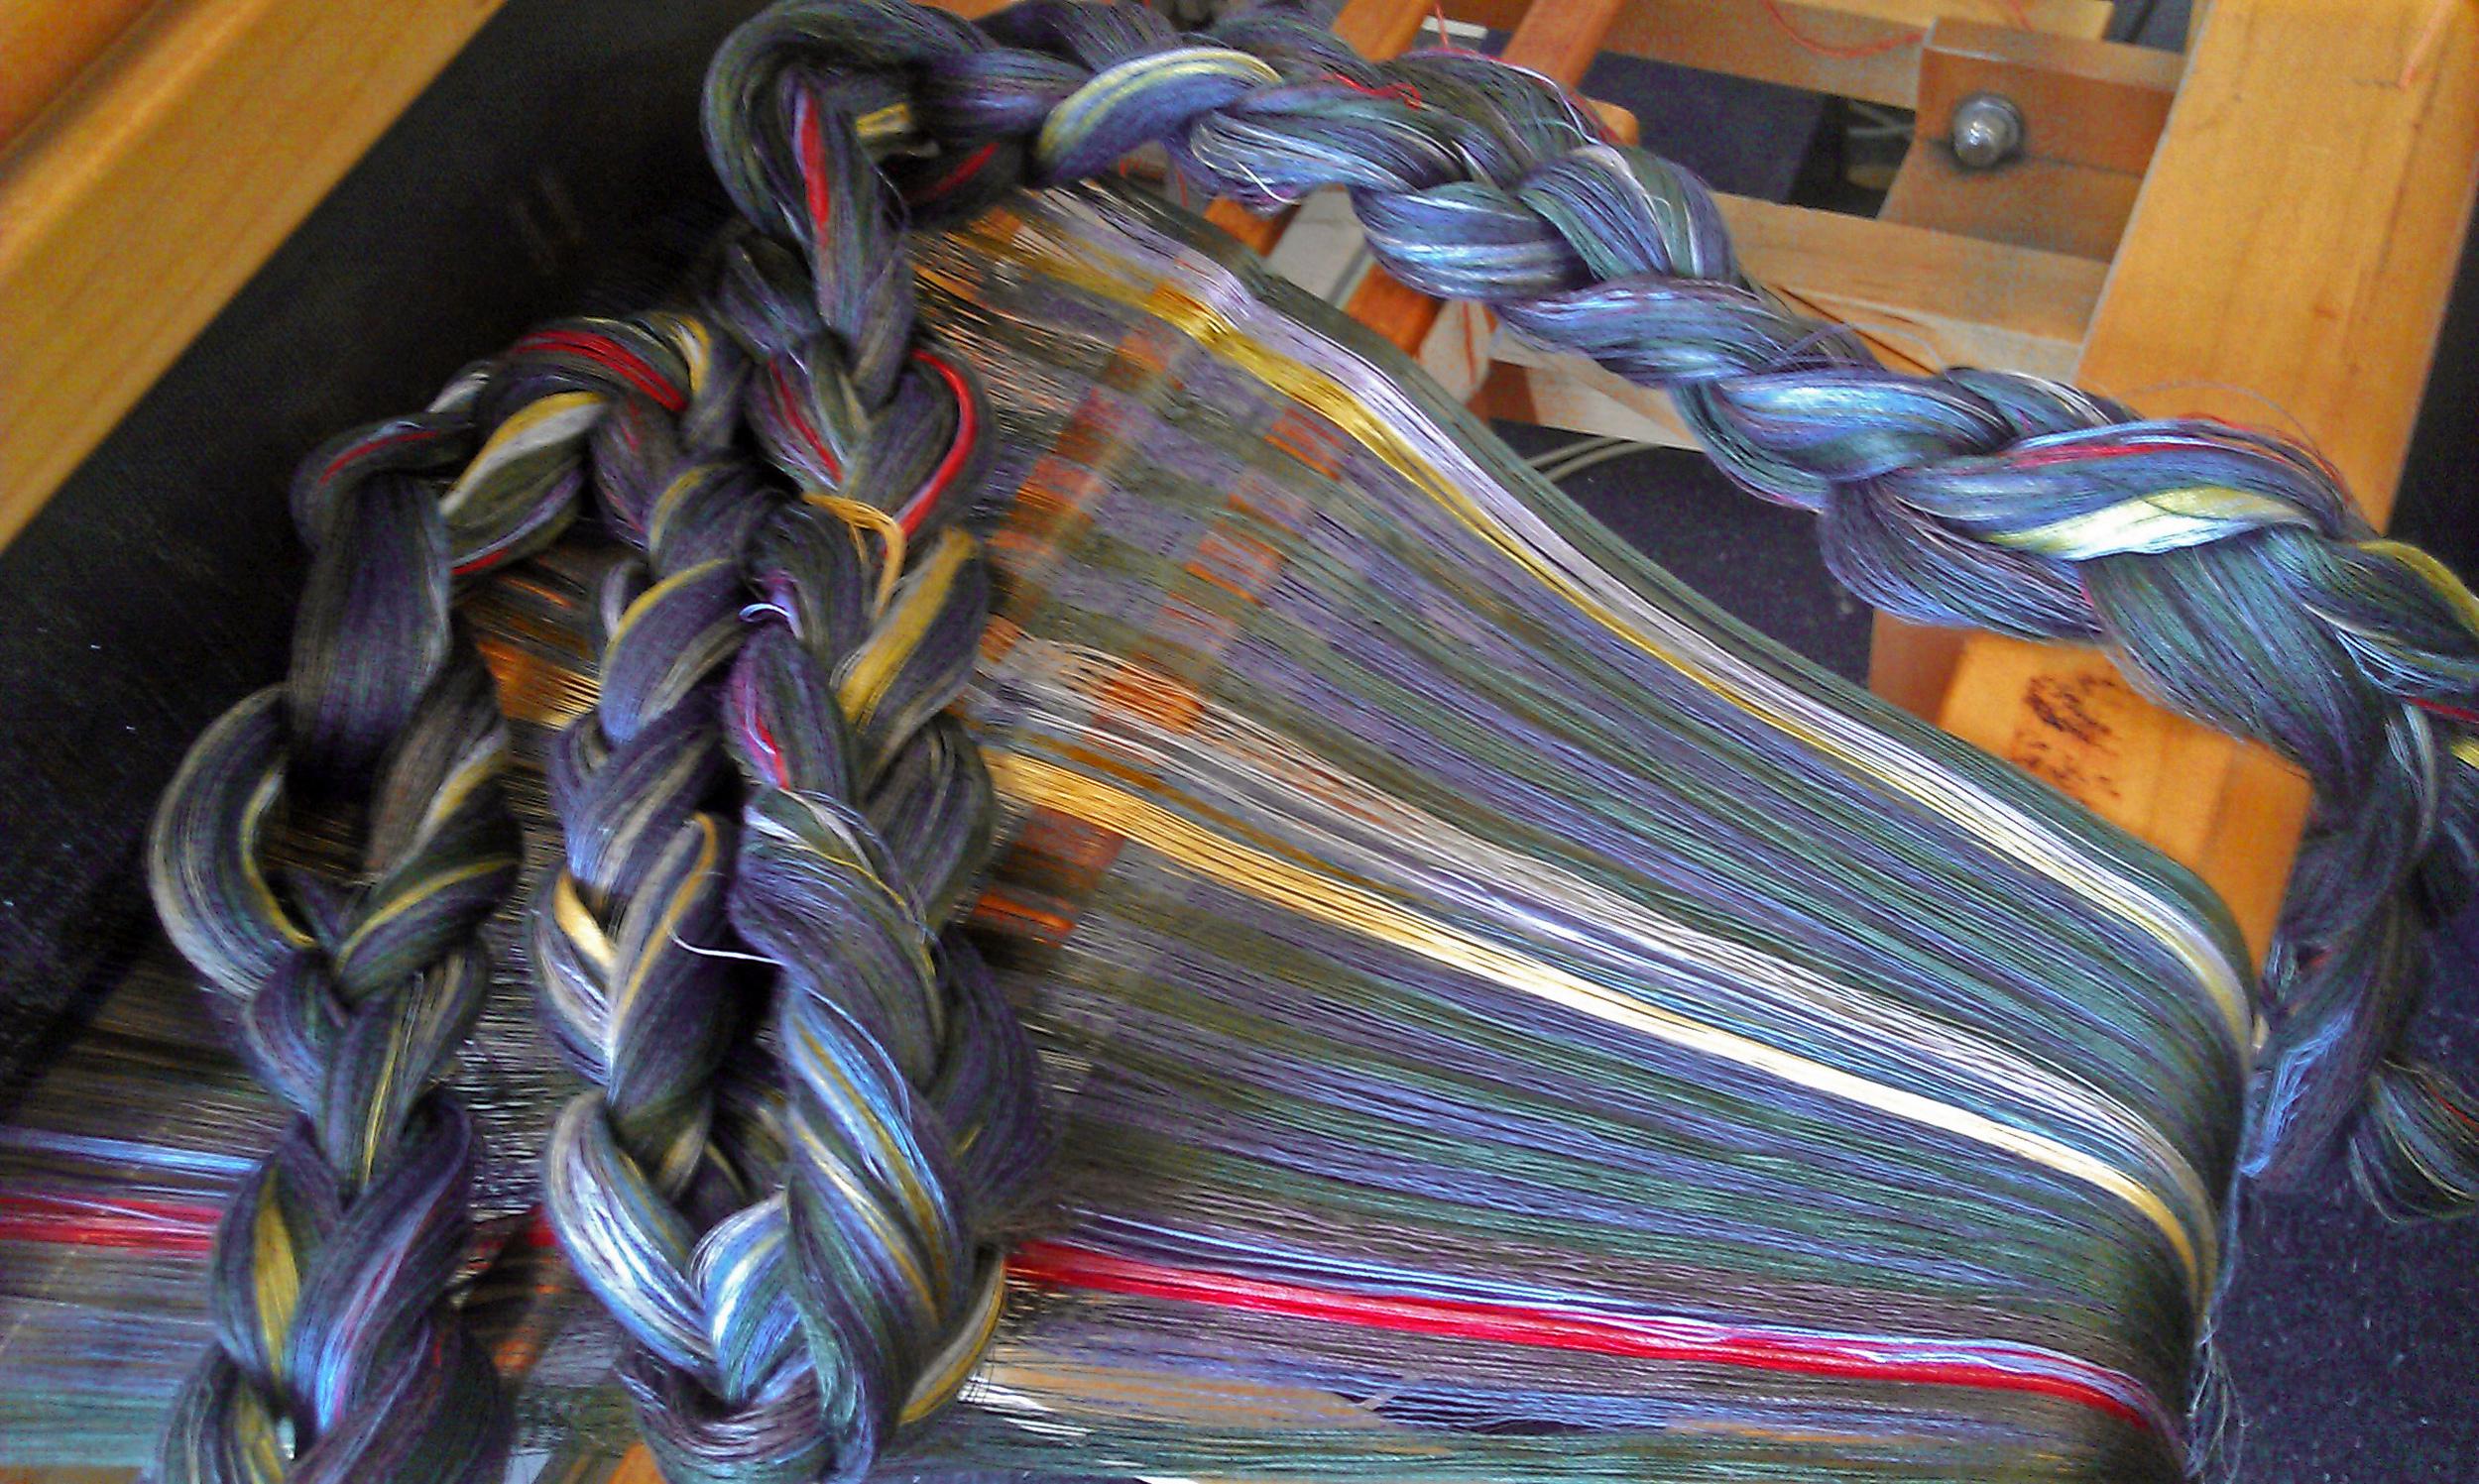 weaving-warp-on-handloom-silk-and-linen-threads-irish-nature-spiritual-song